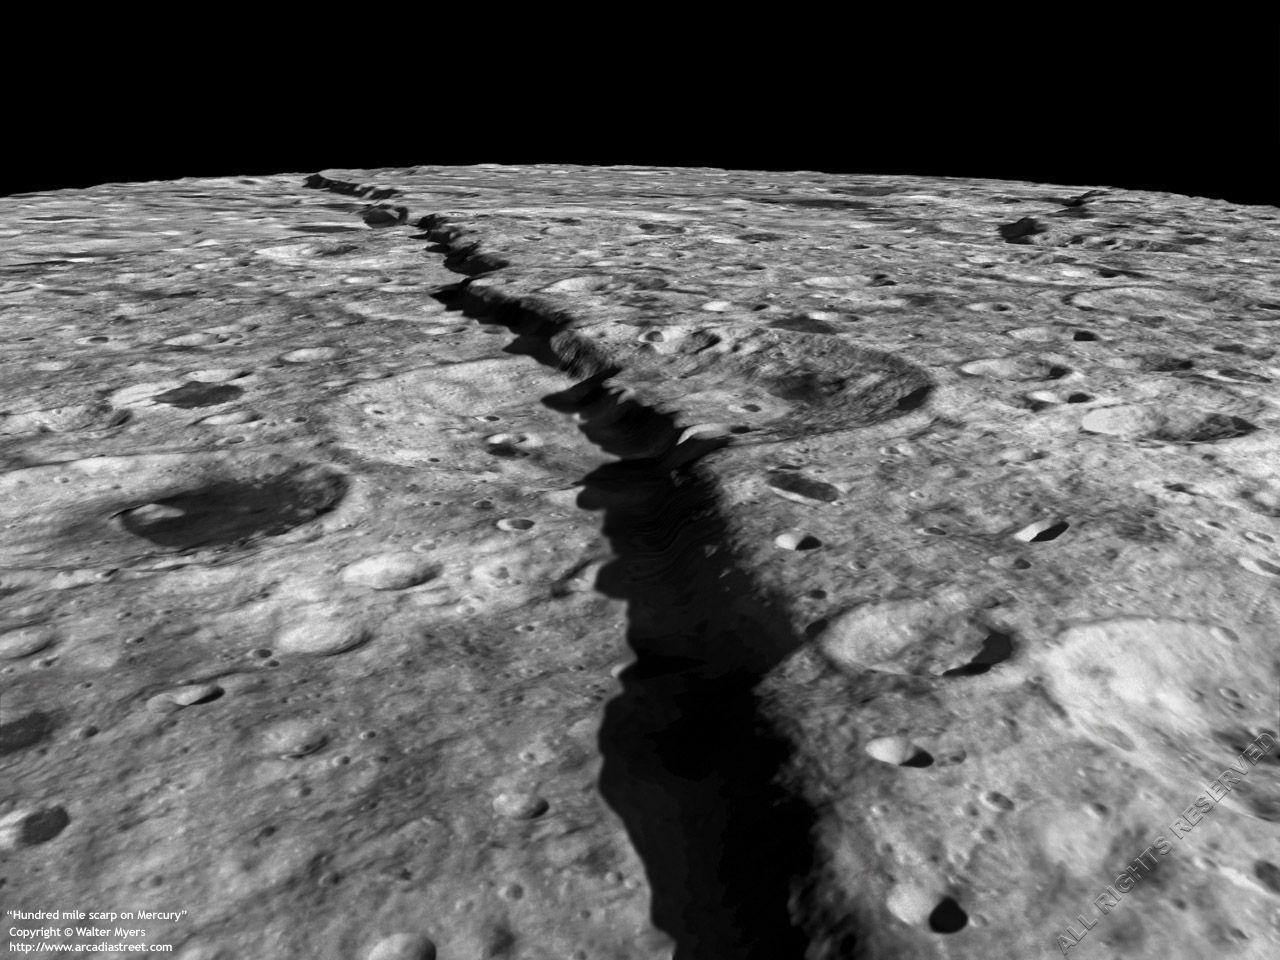 Superficie Rocosa Del Planeta Mercurio Planets And Moons Earth